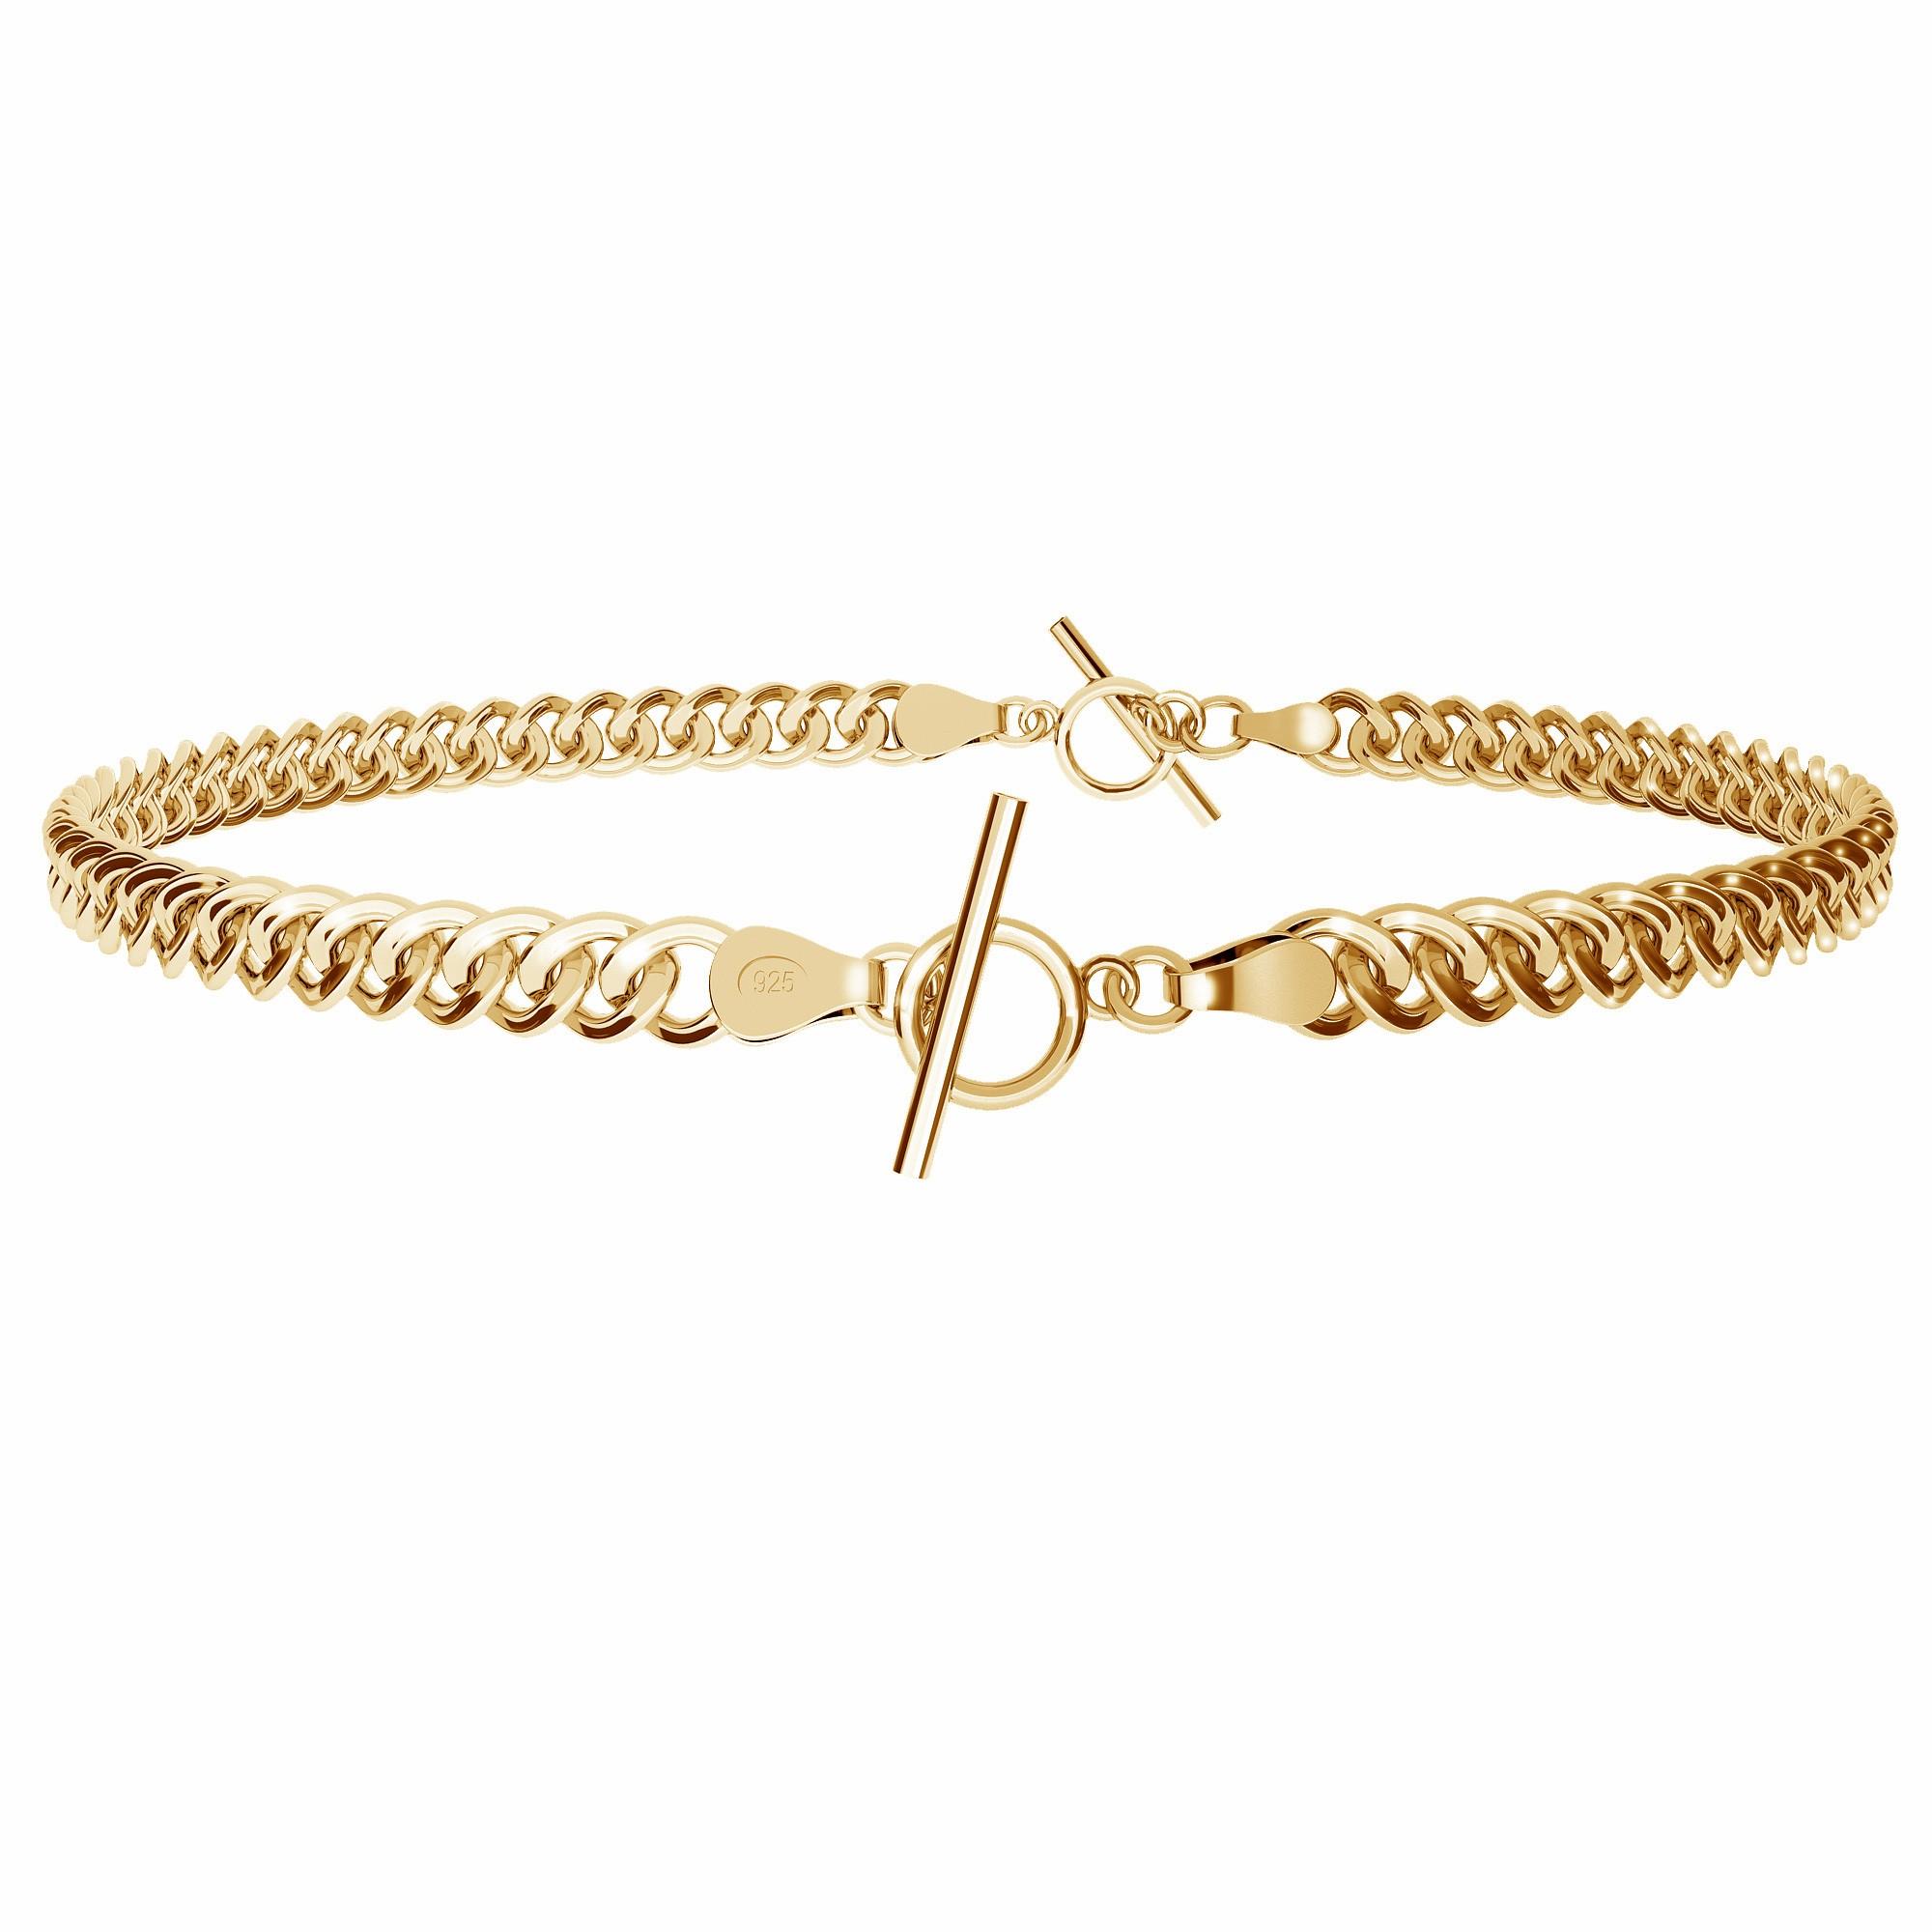 Choker or bracelet, chain sterling silver 925